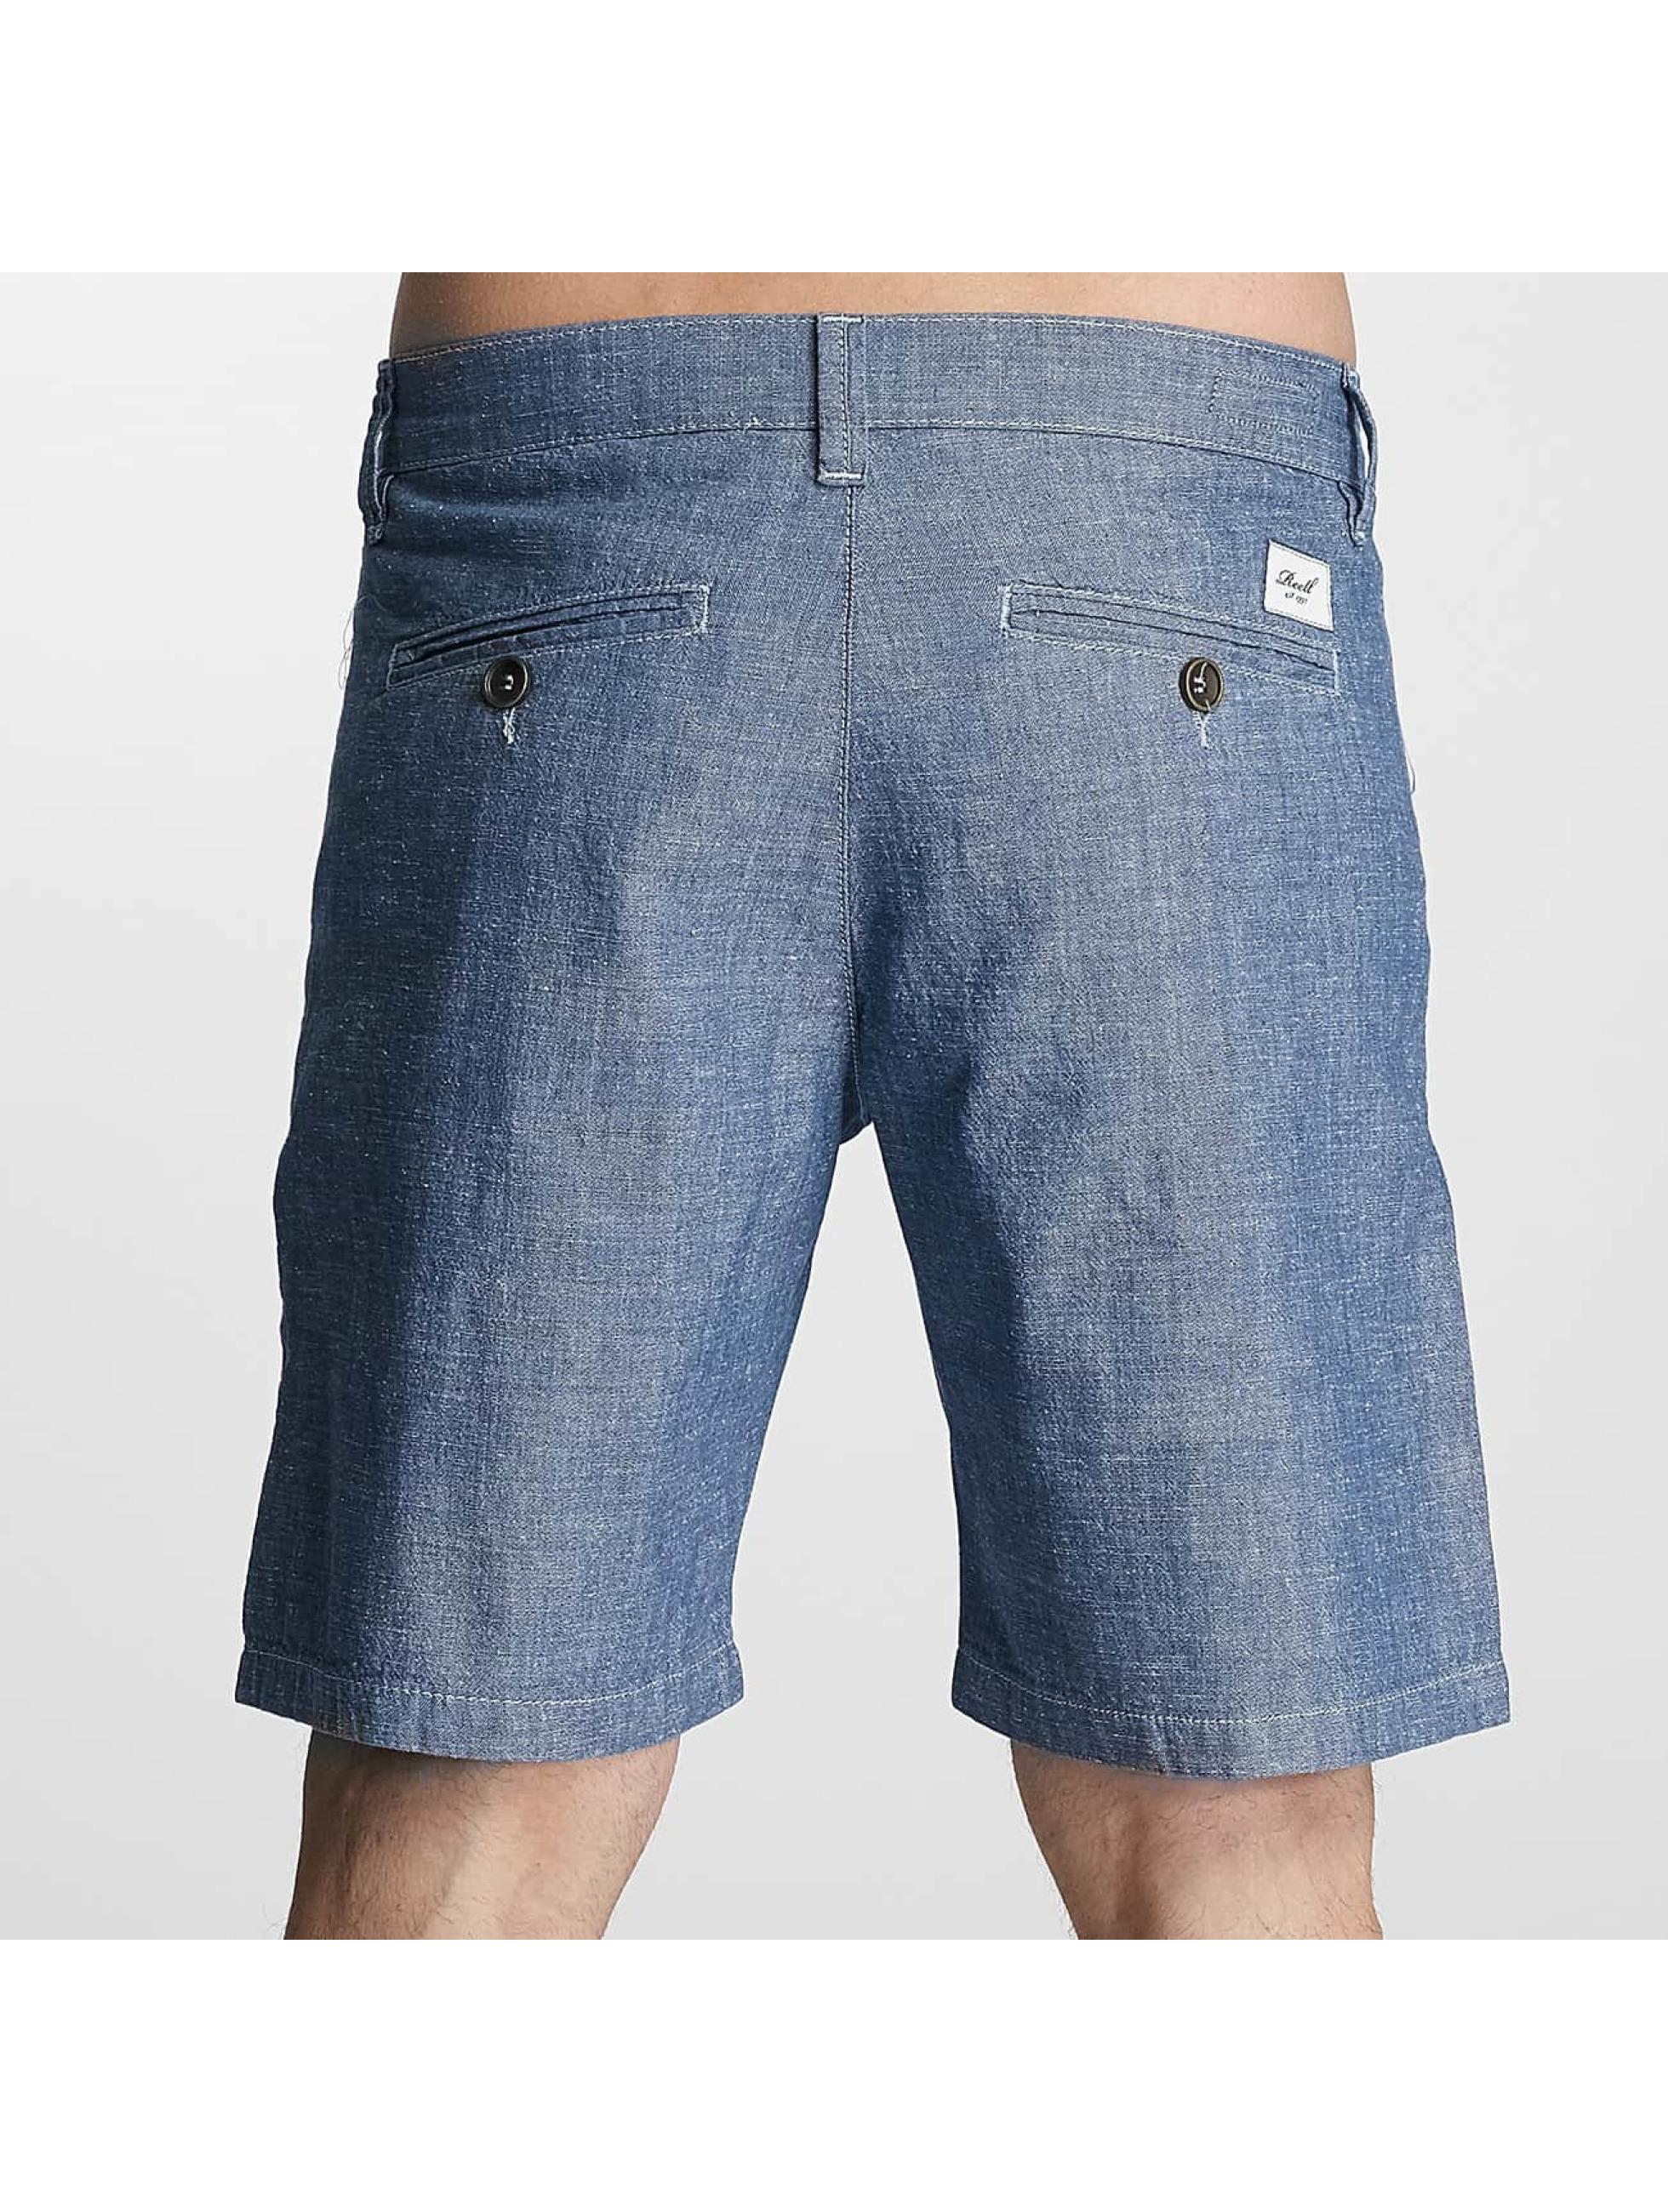 Reell Jeans Short Miami indigo